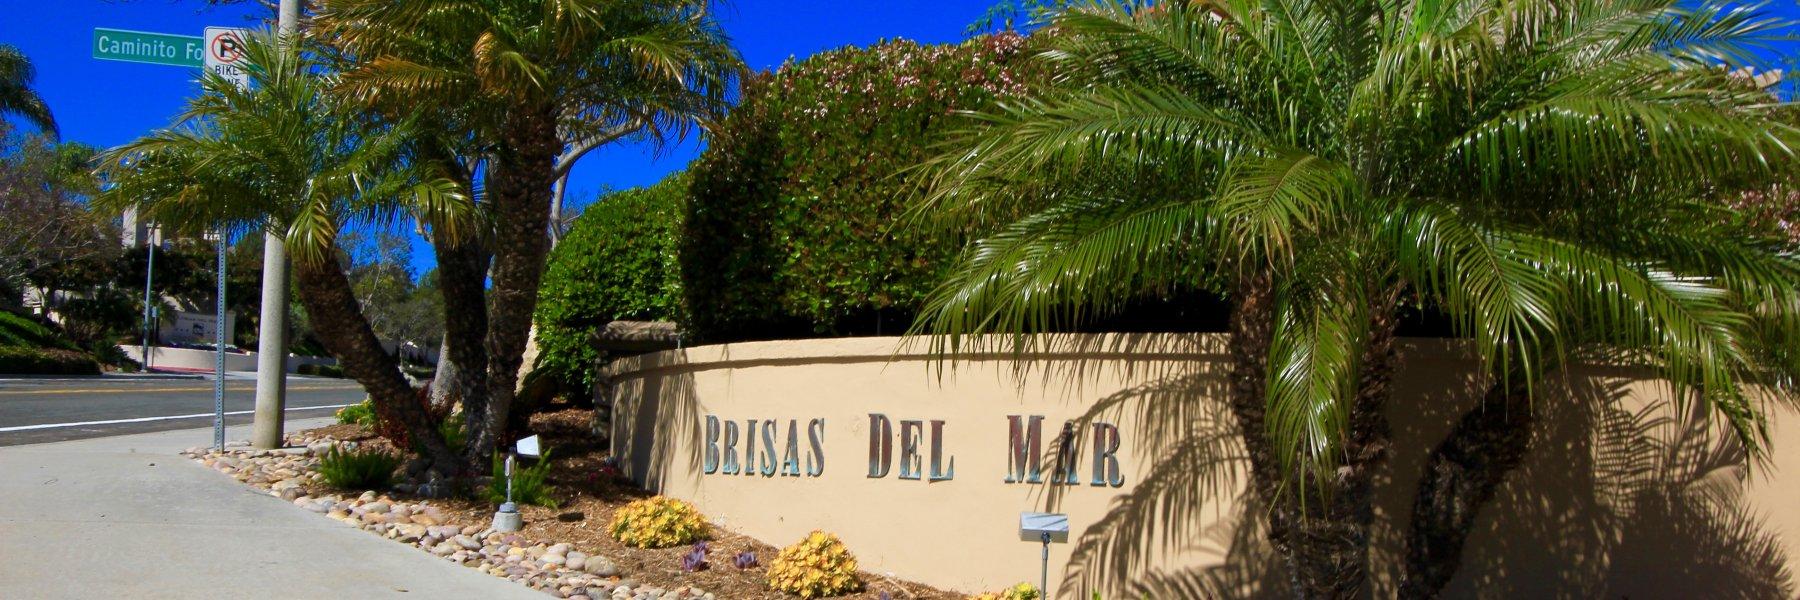 Brisas Del Mar is a community of homes in Del Mar California